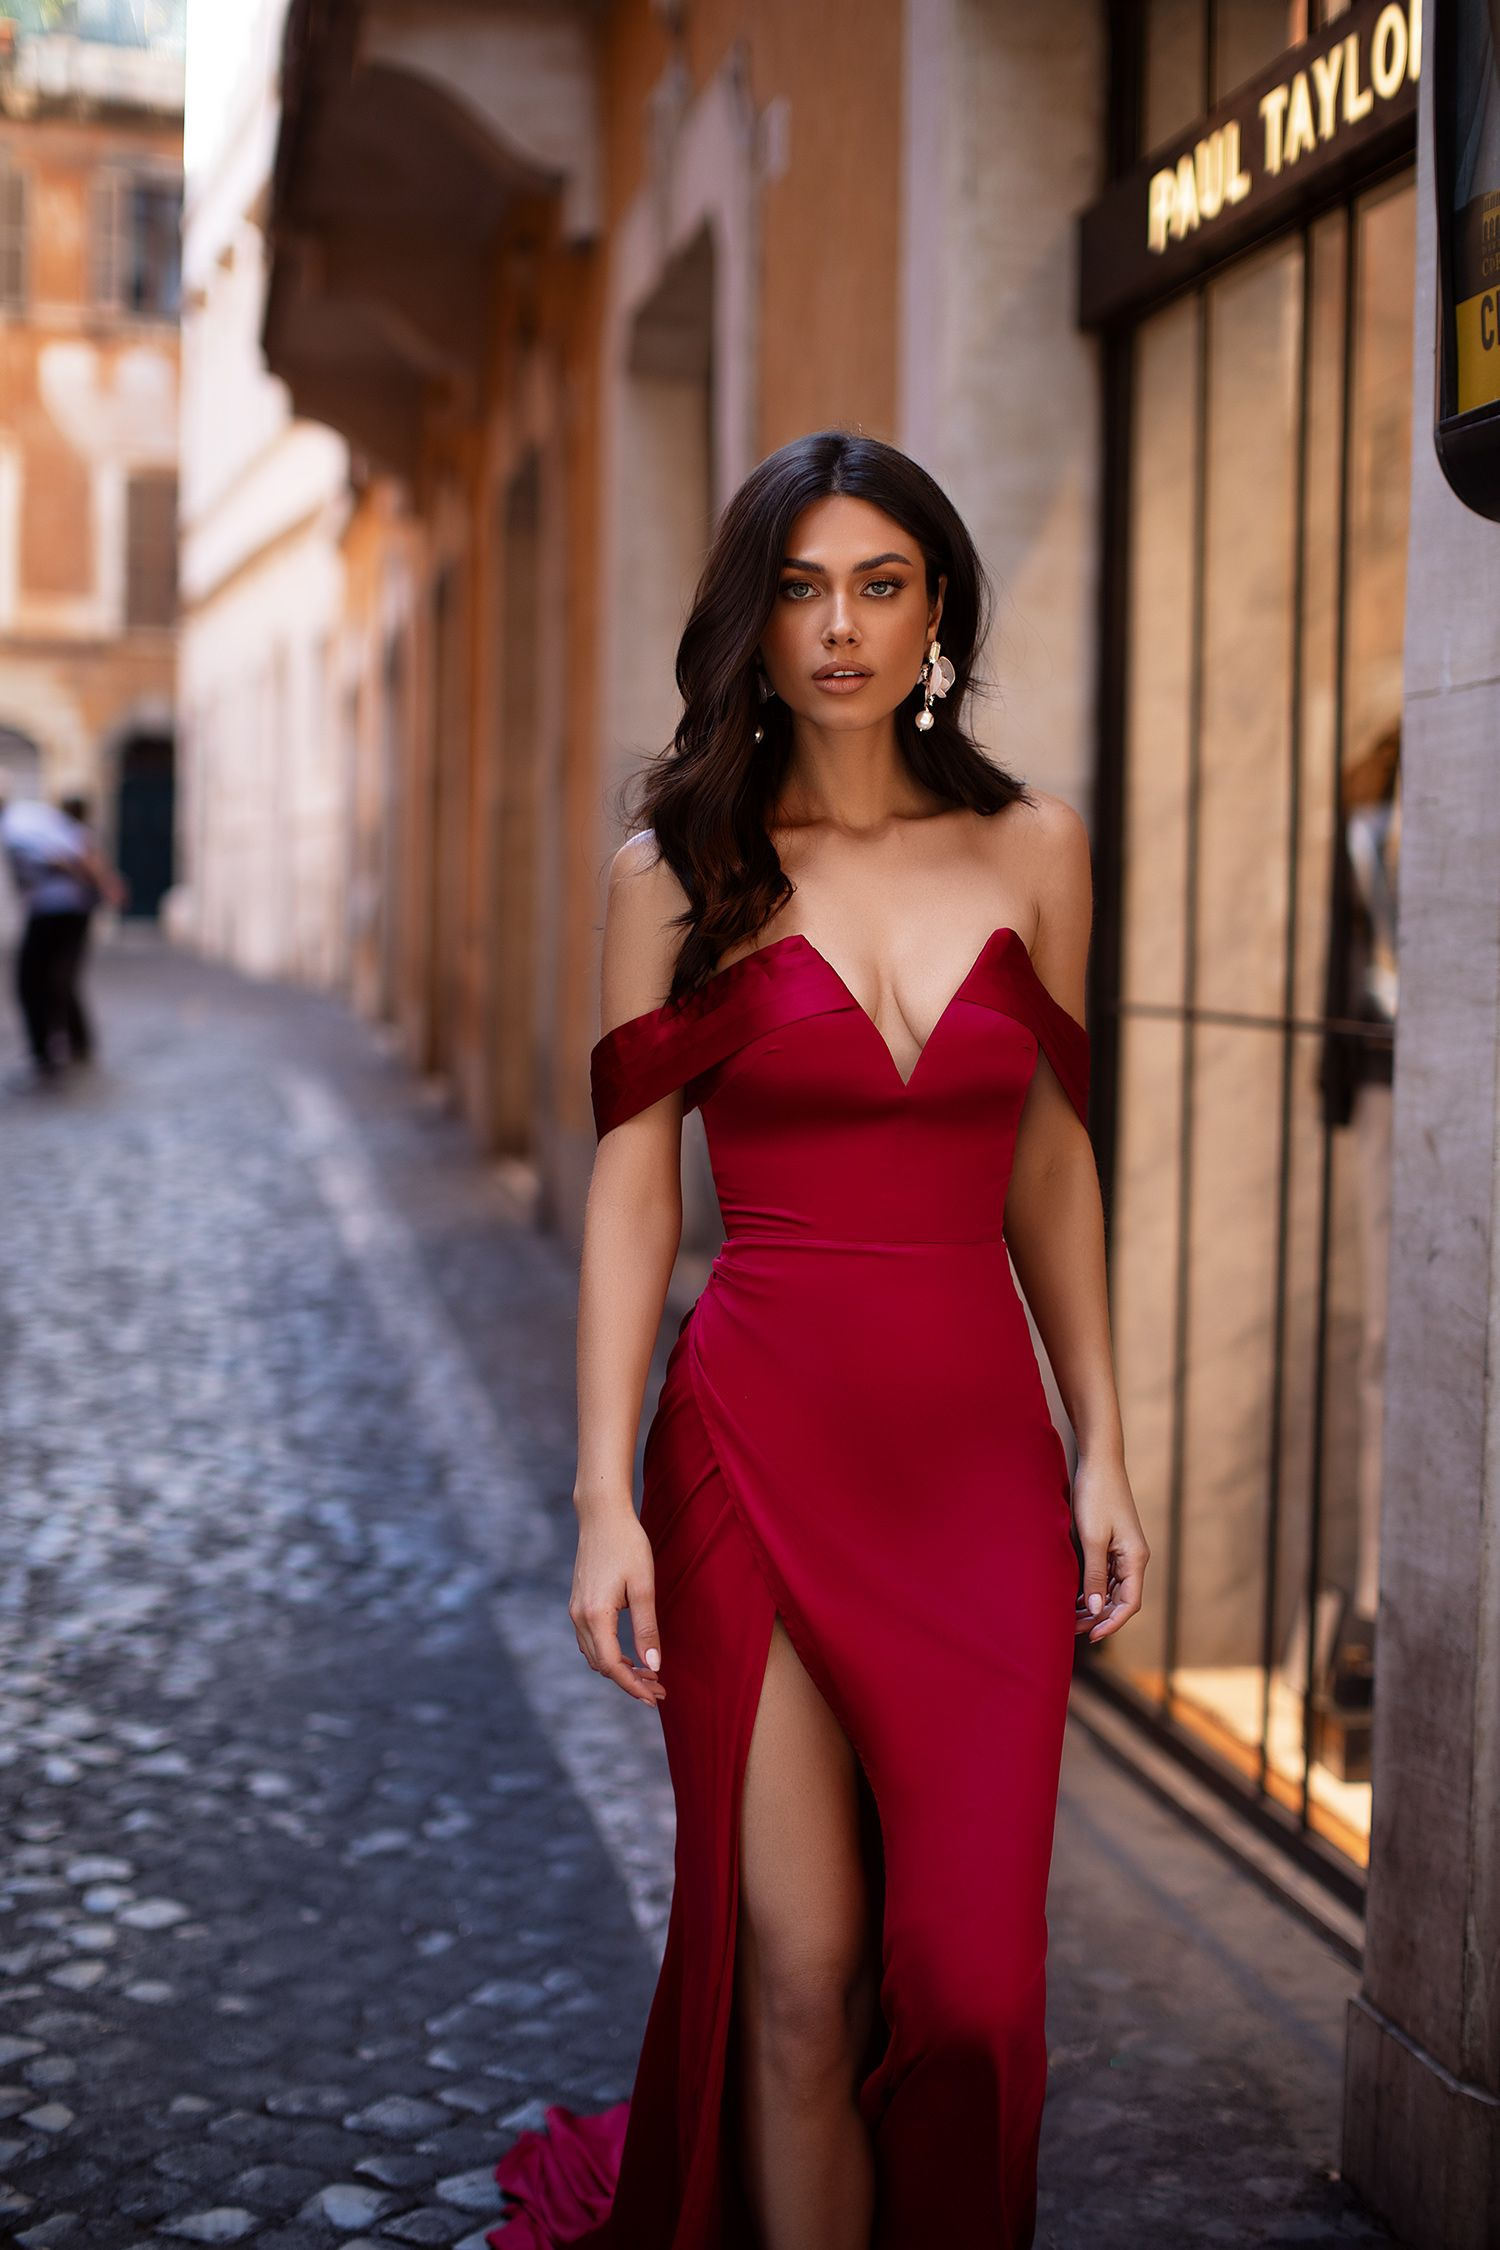 Lorenza Wine Red Red Dress Women Red Wedding Dresses Red Dress [ 2250 x 1500 Pixel ]